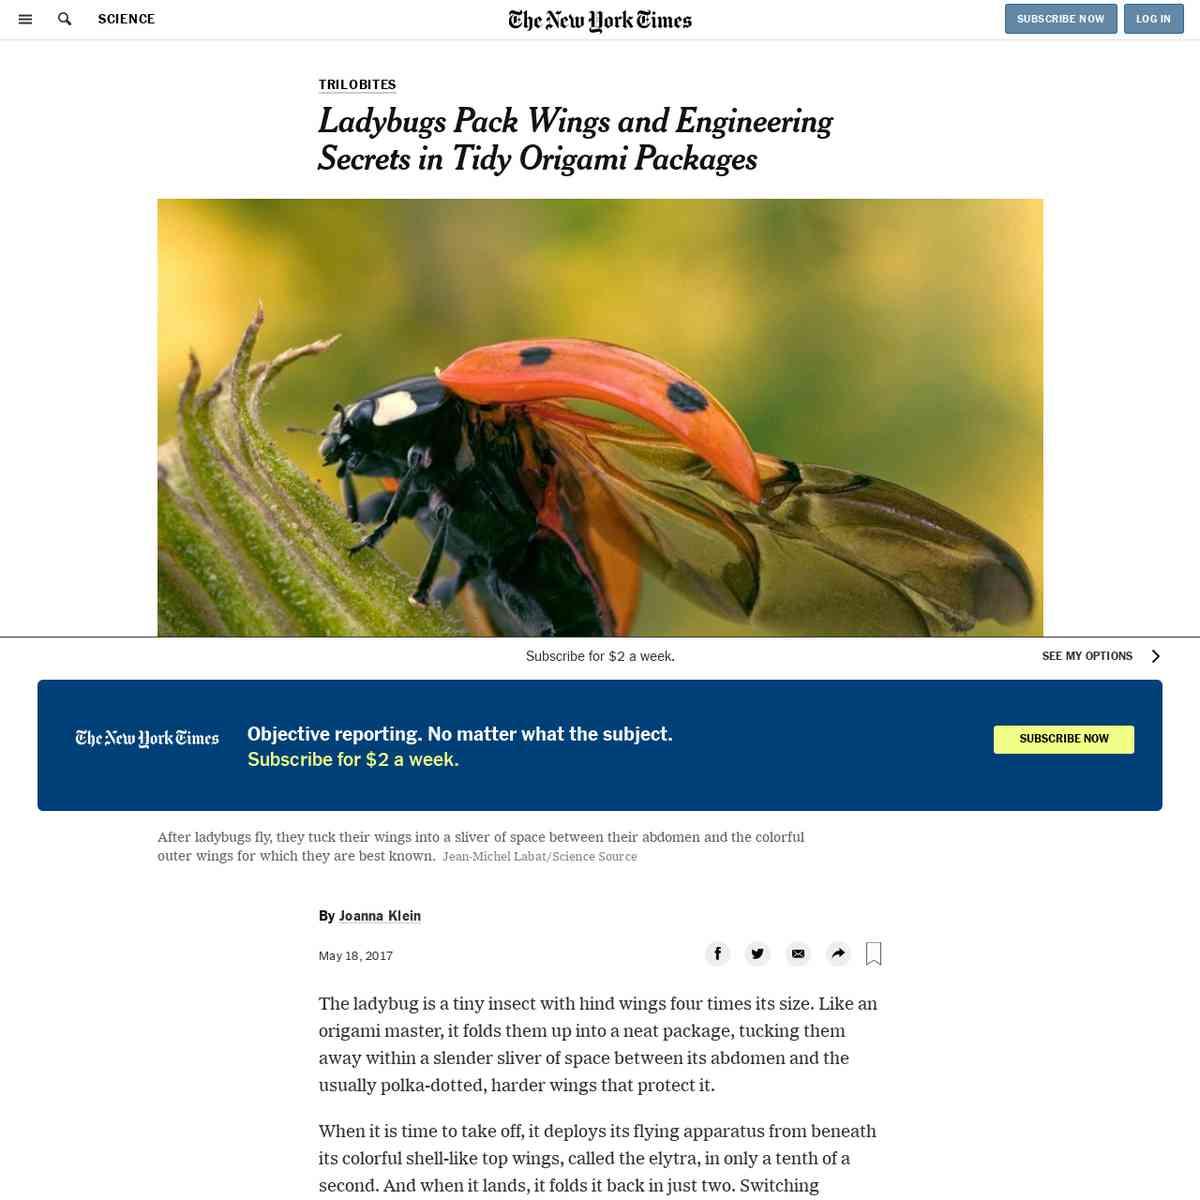 Ladybug Wings / Deployable structures